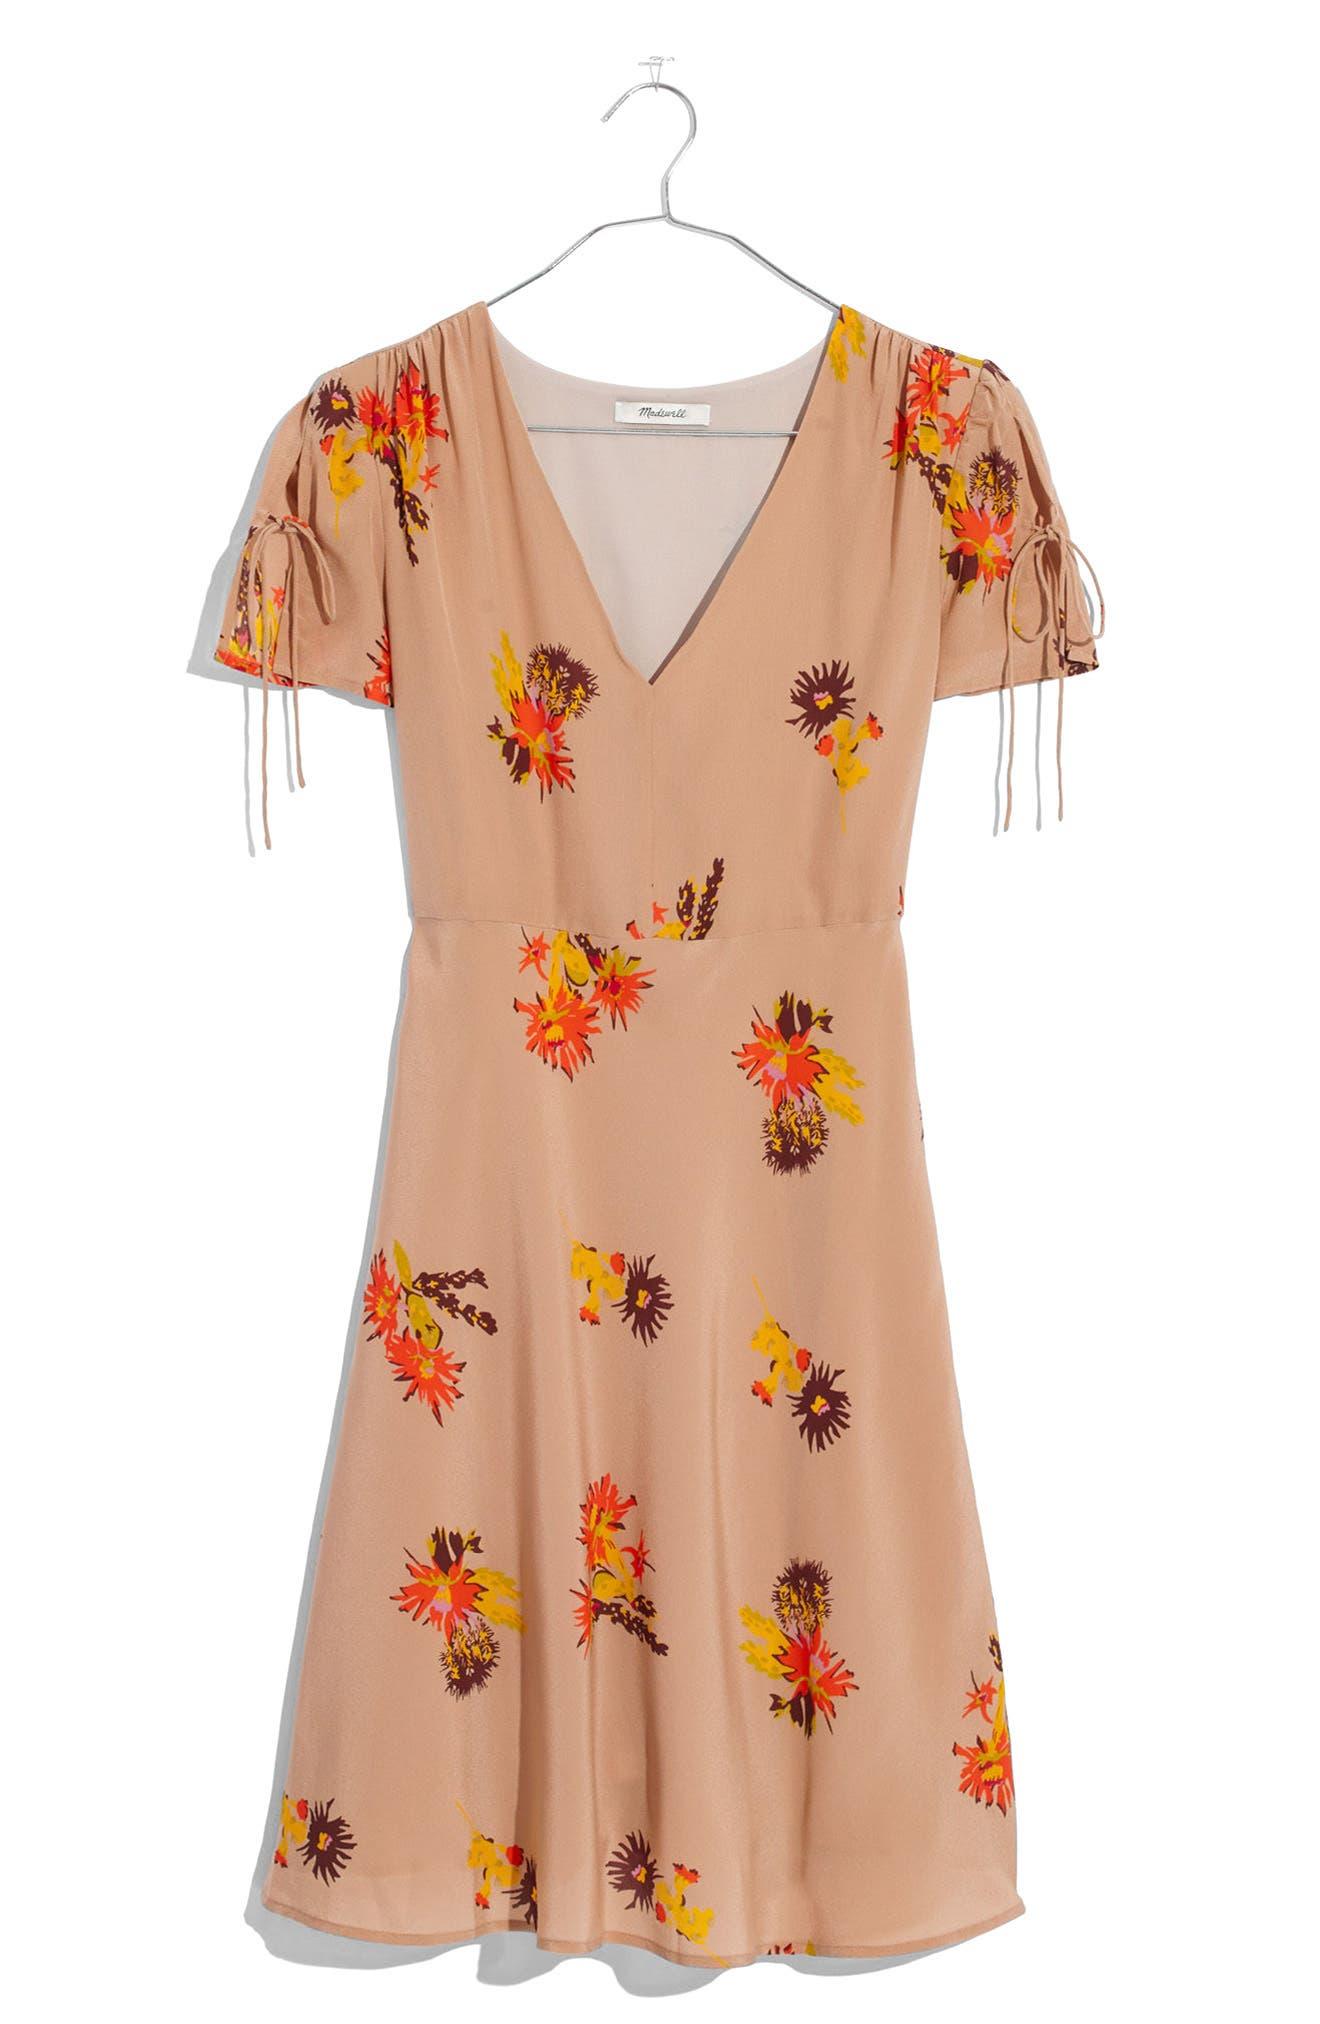 Alternate Image 1 Selected - Madewell Cactus Flower Silk Dress